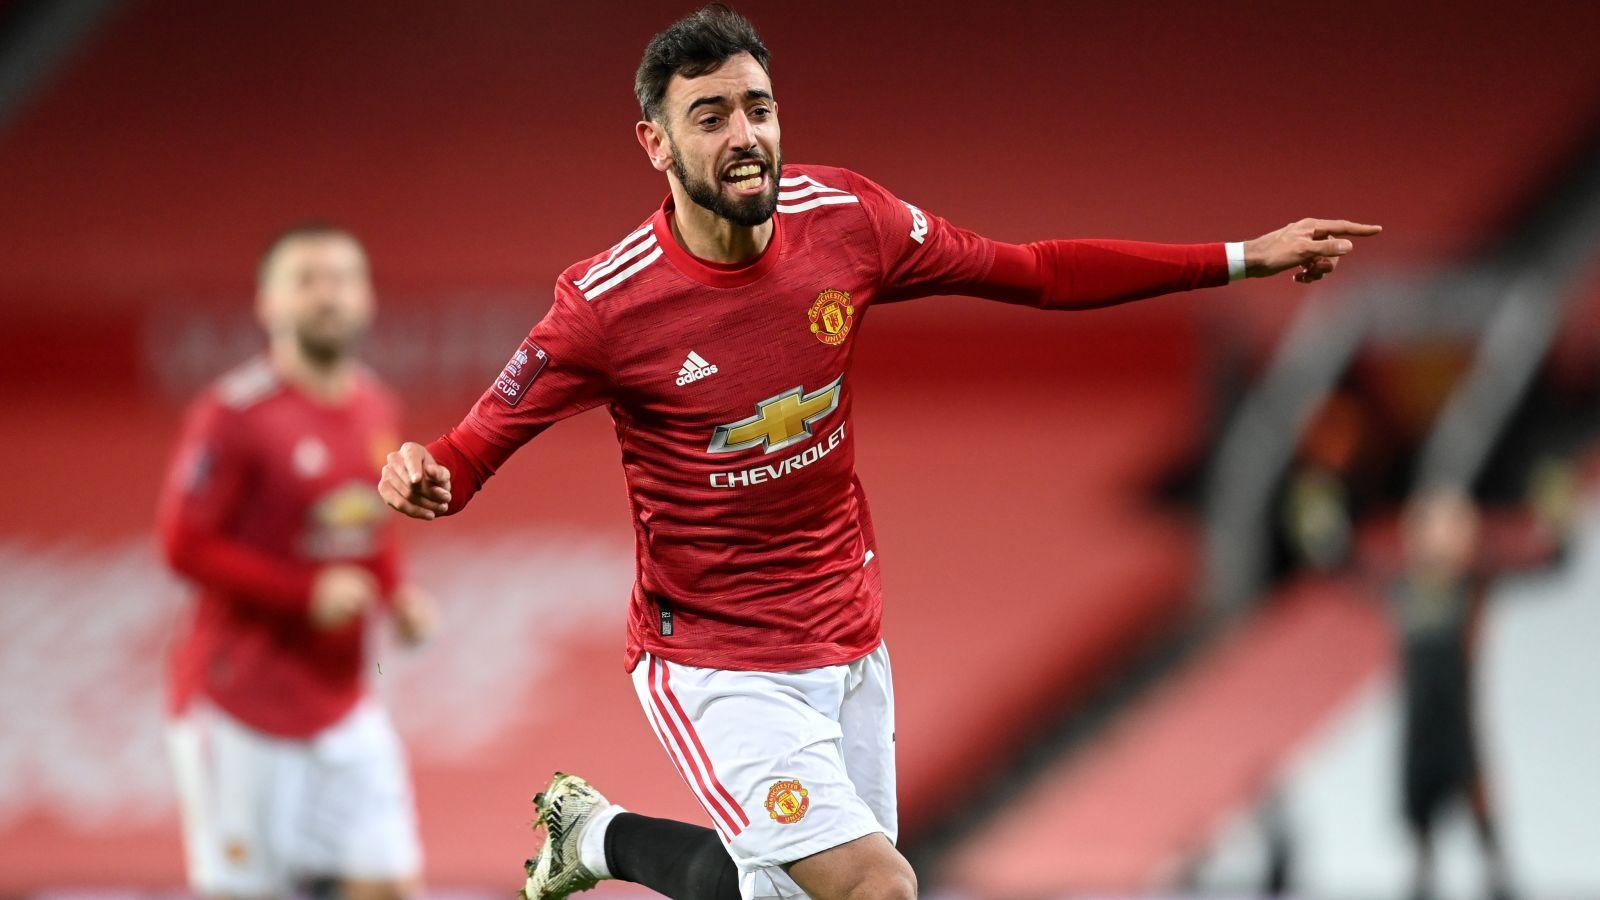 Jadwal Liga Europa Hari Ini: Manchester United vs Real Sociedad